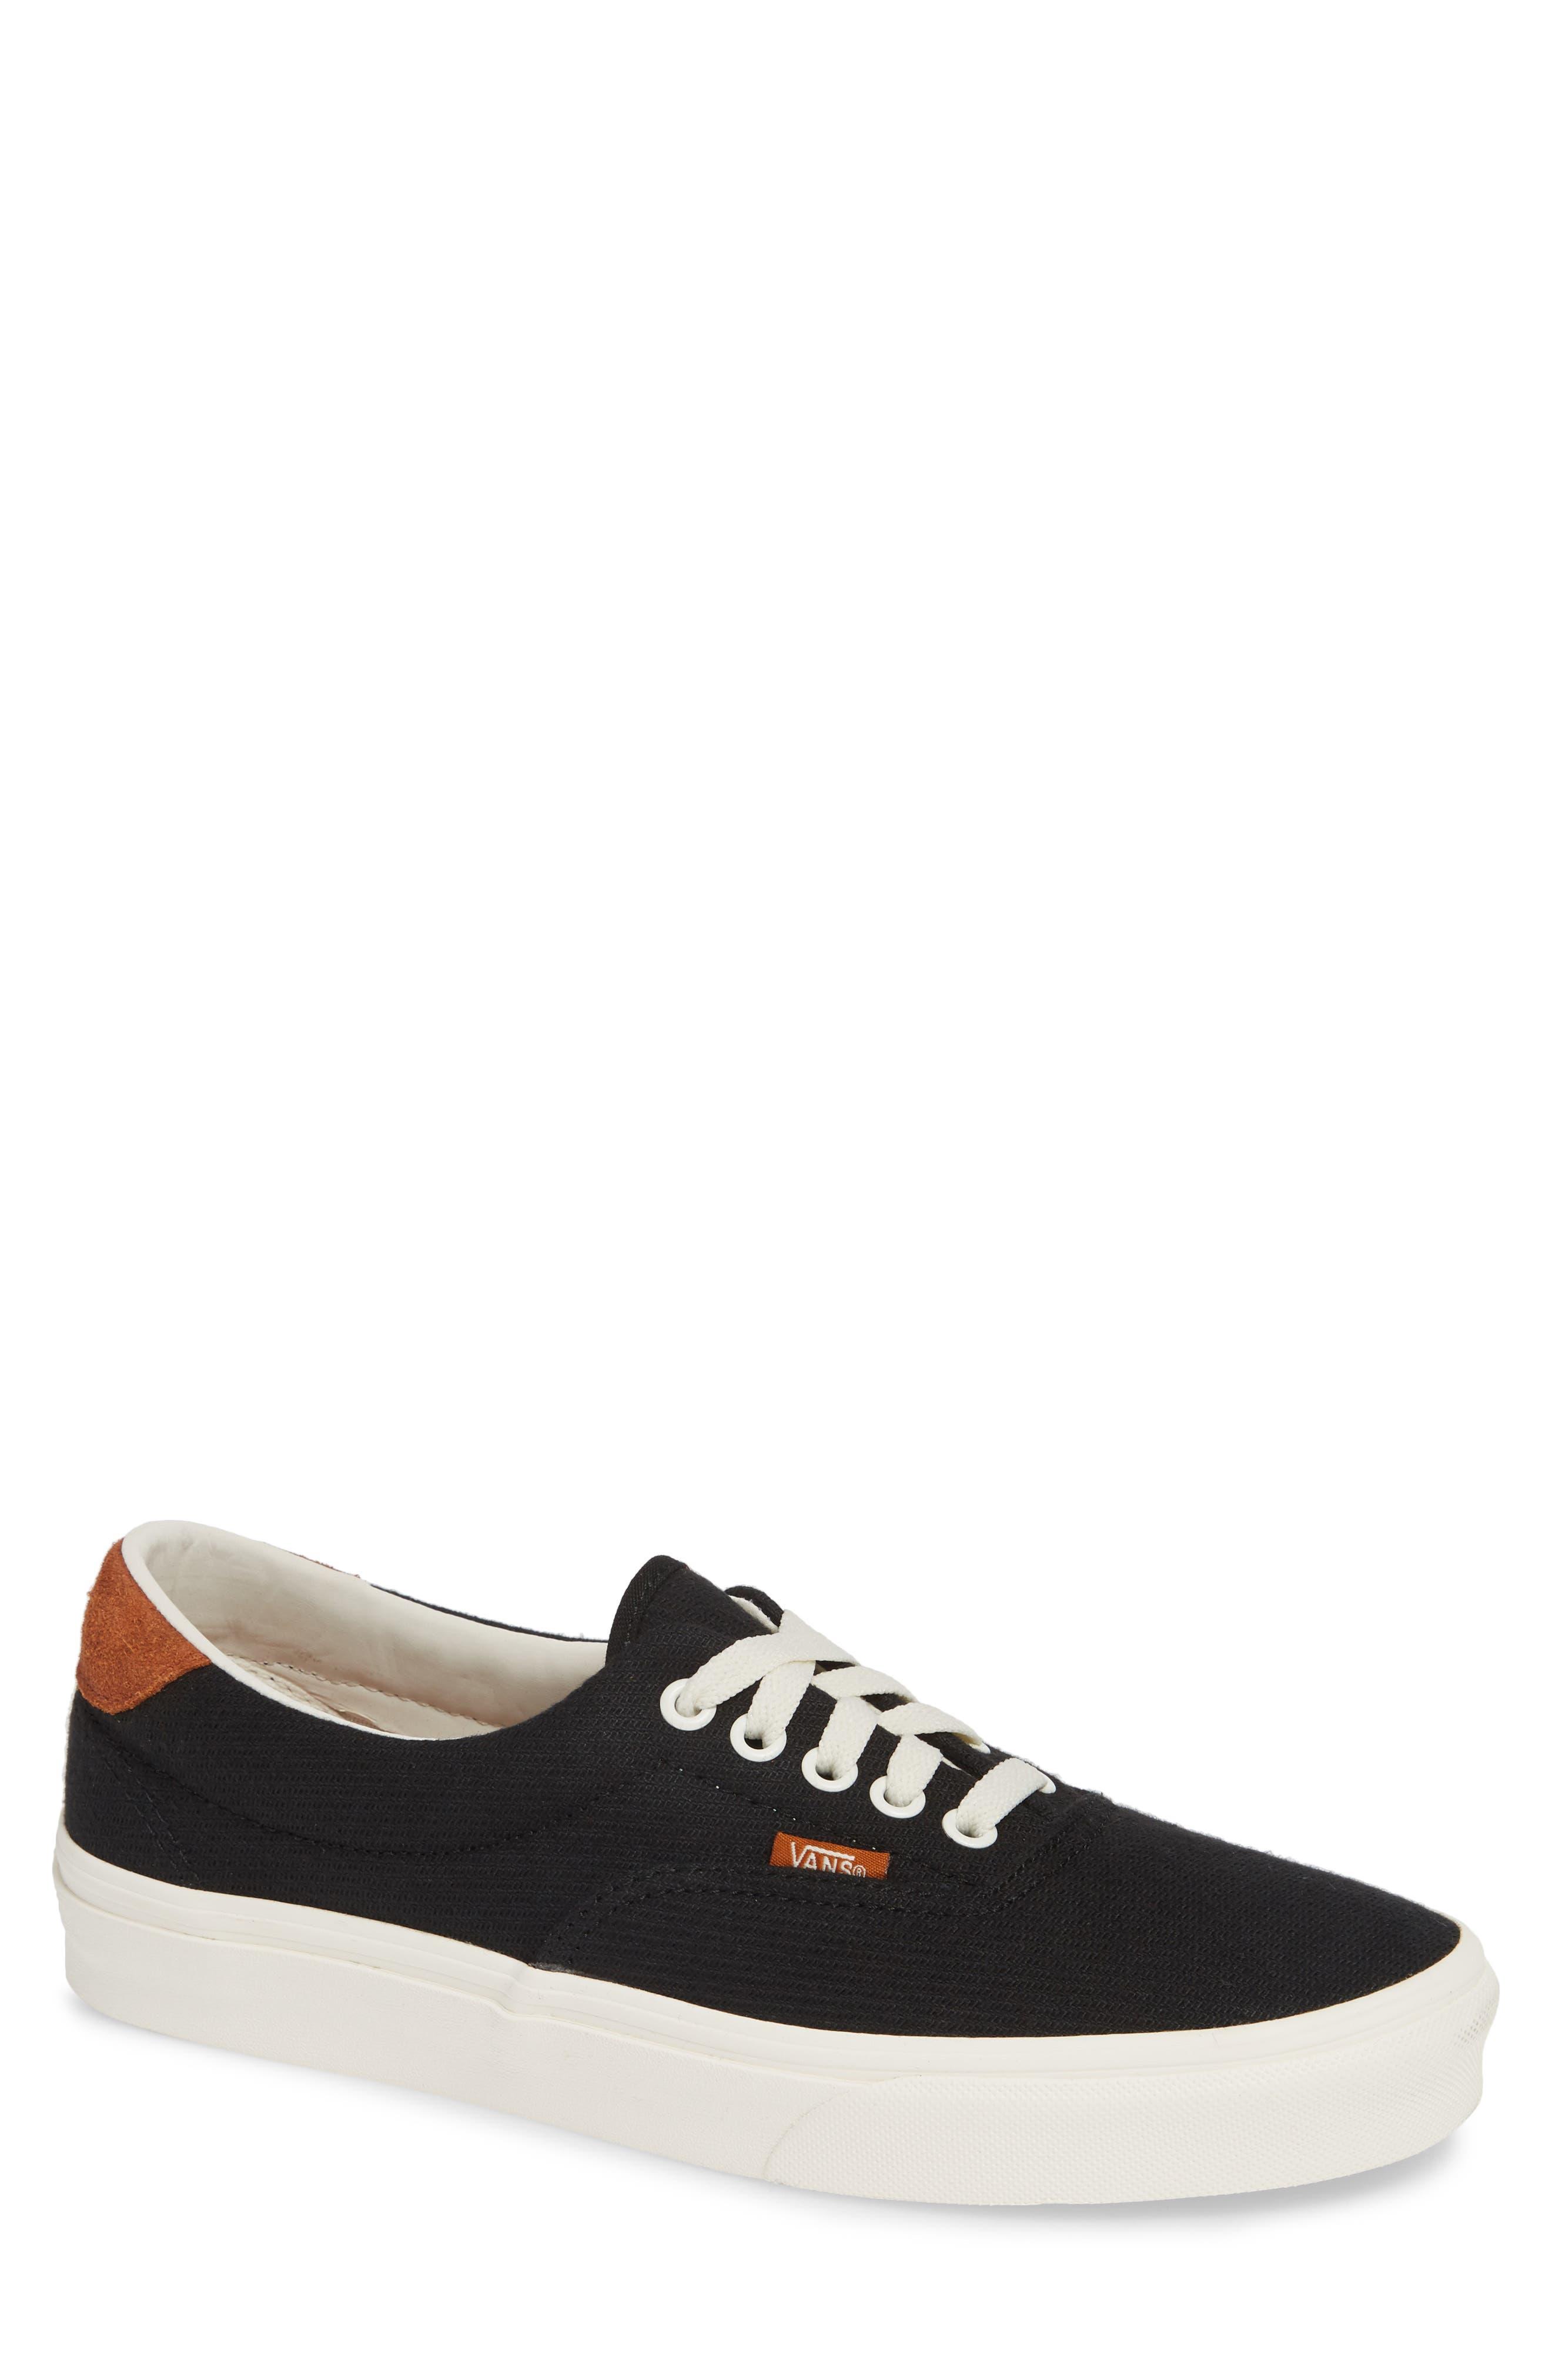 Flannel Era Sneaker,                             Main thumbnail 1, color,                             BLACK FLANNEL FLANNEL